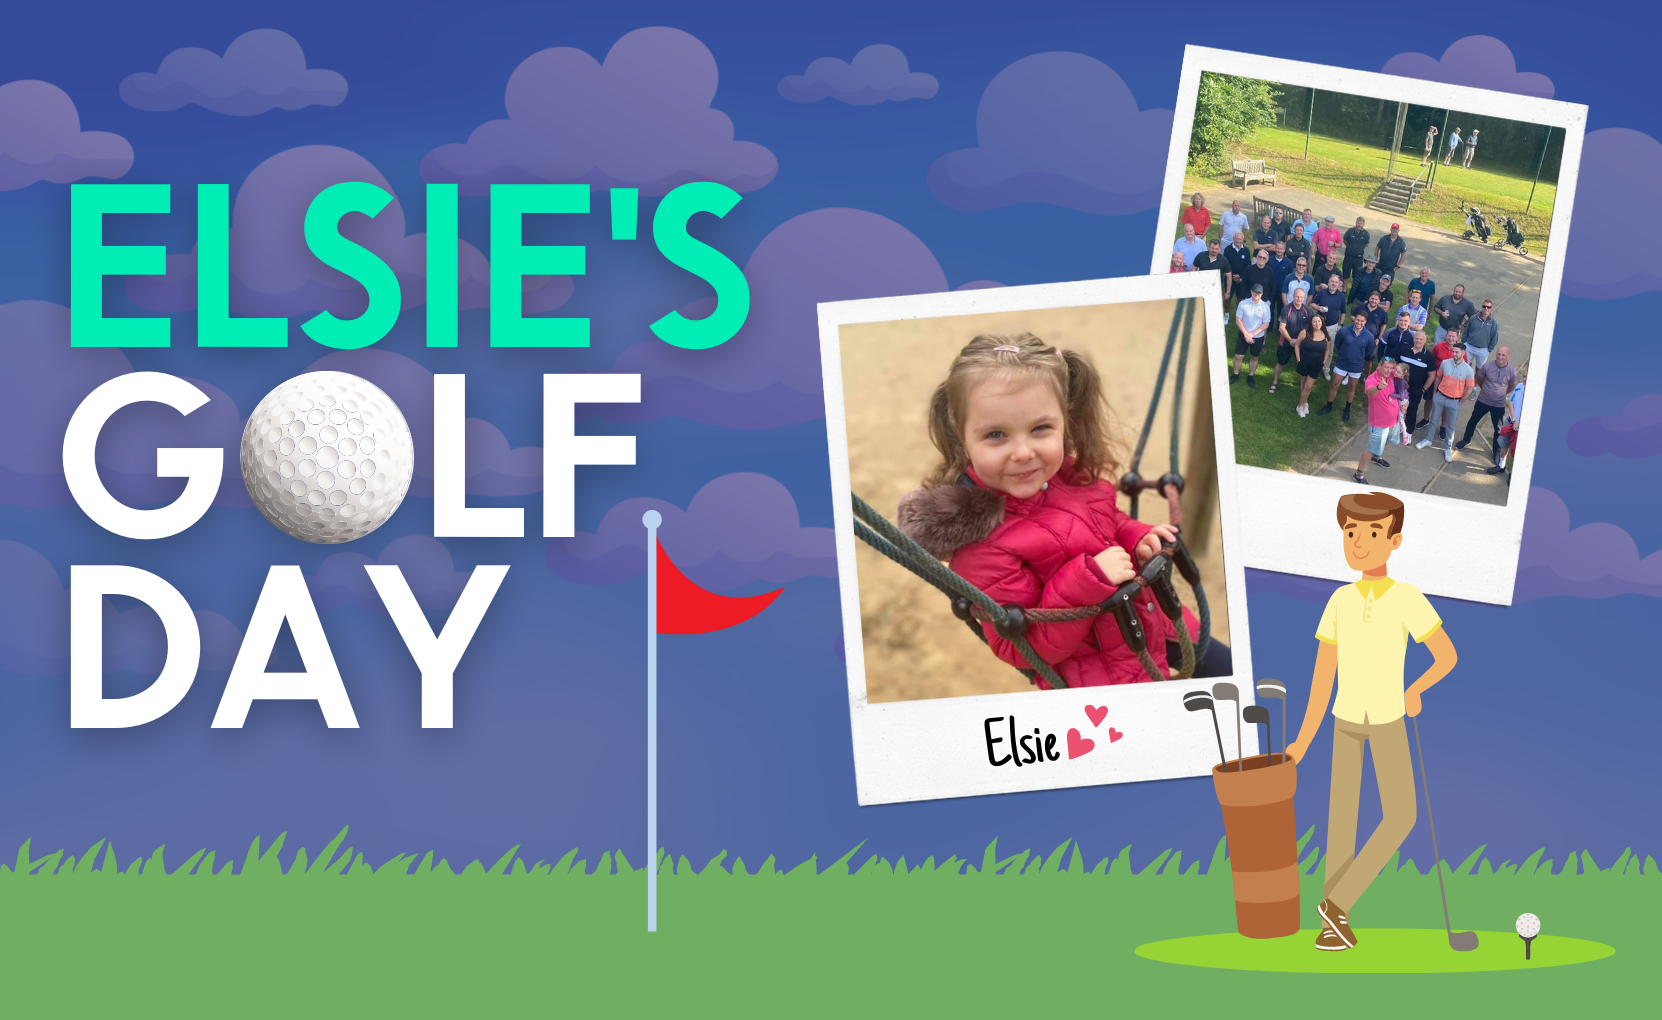 Elsie's Golf Day